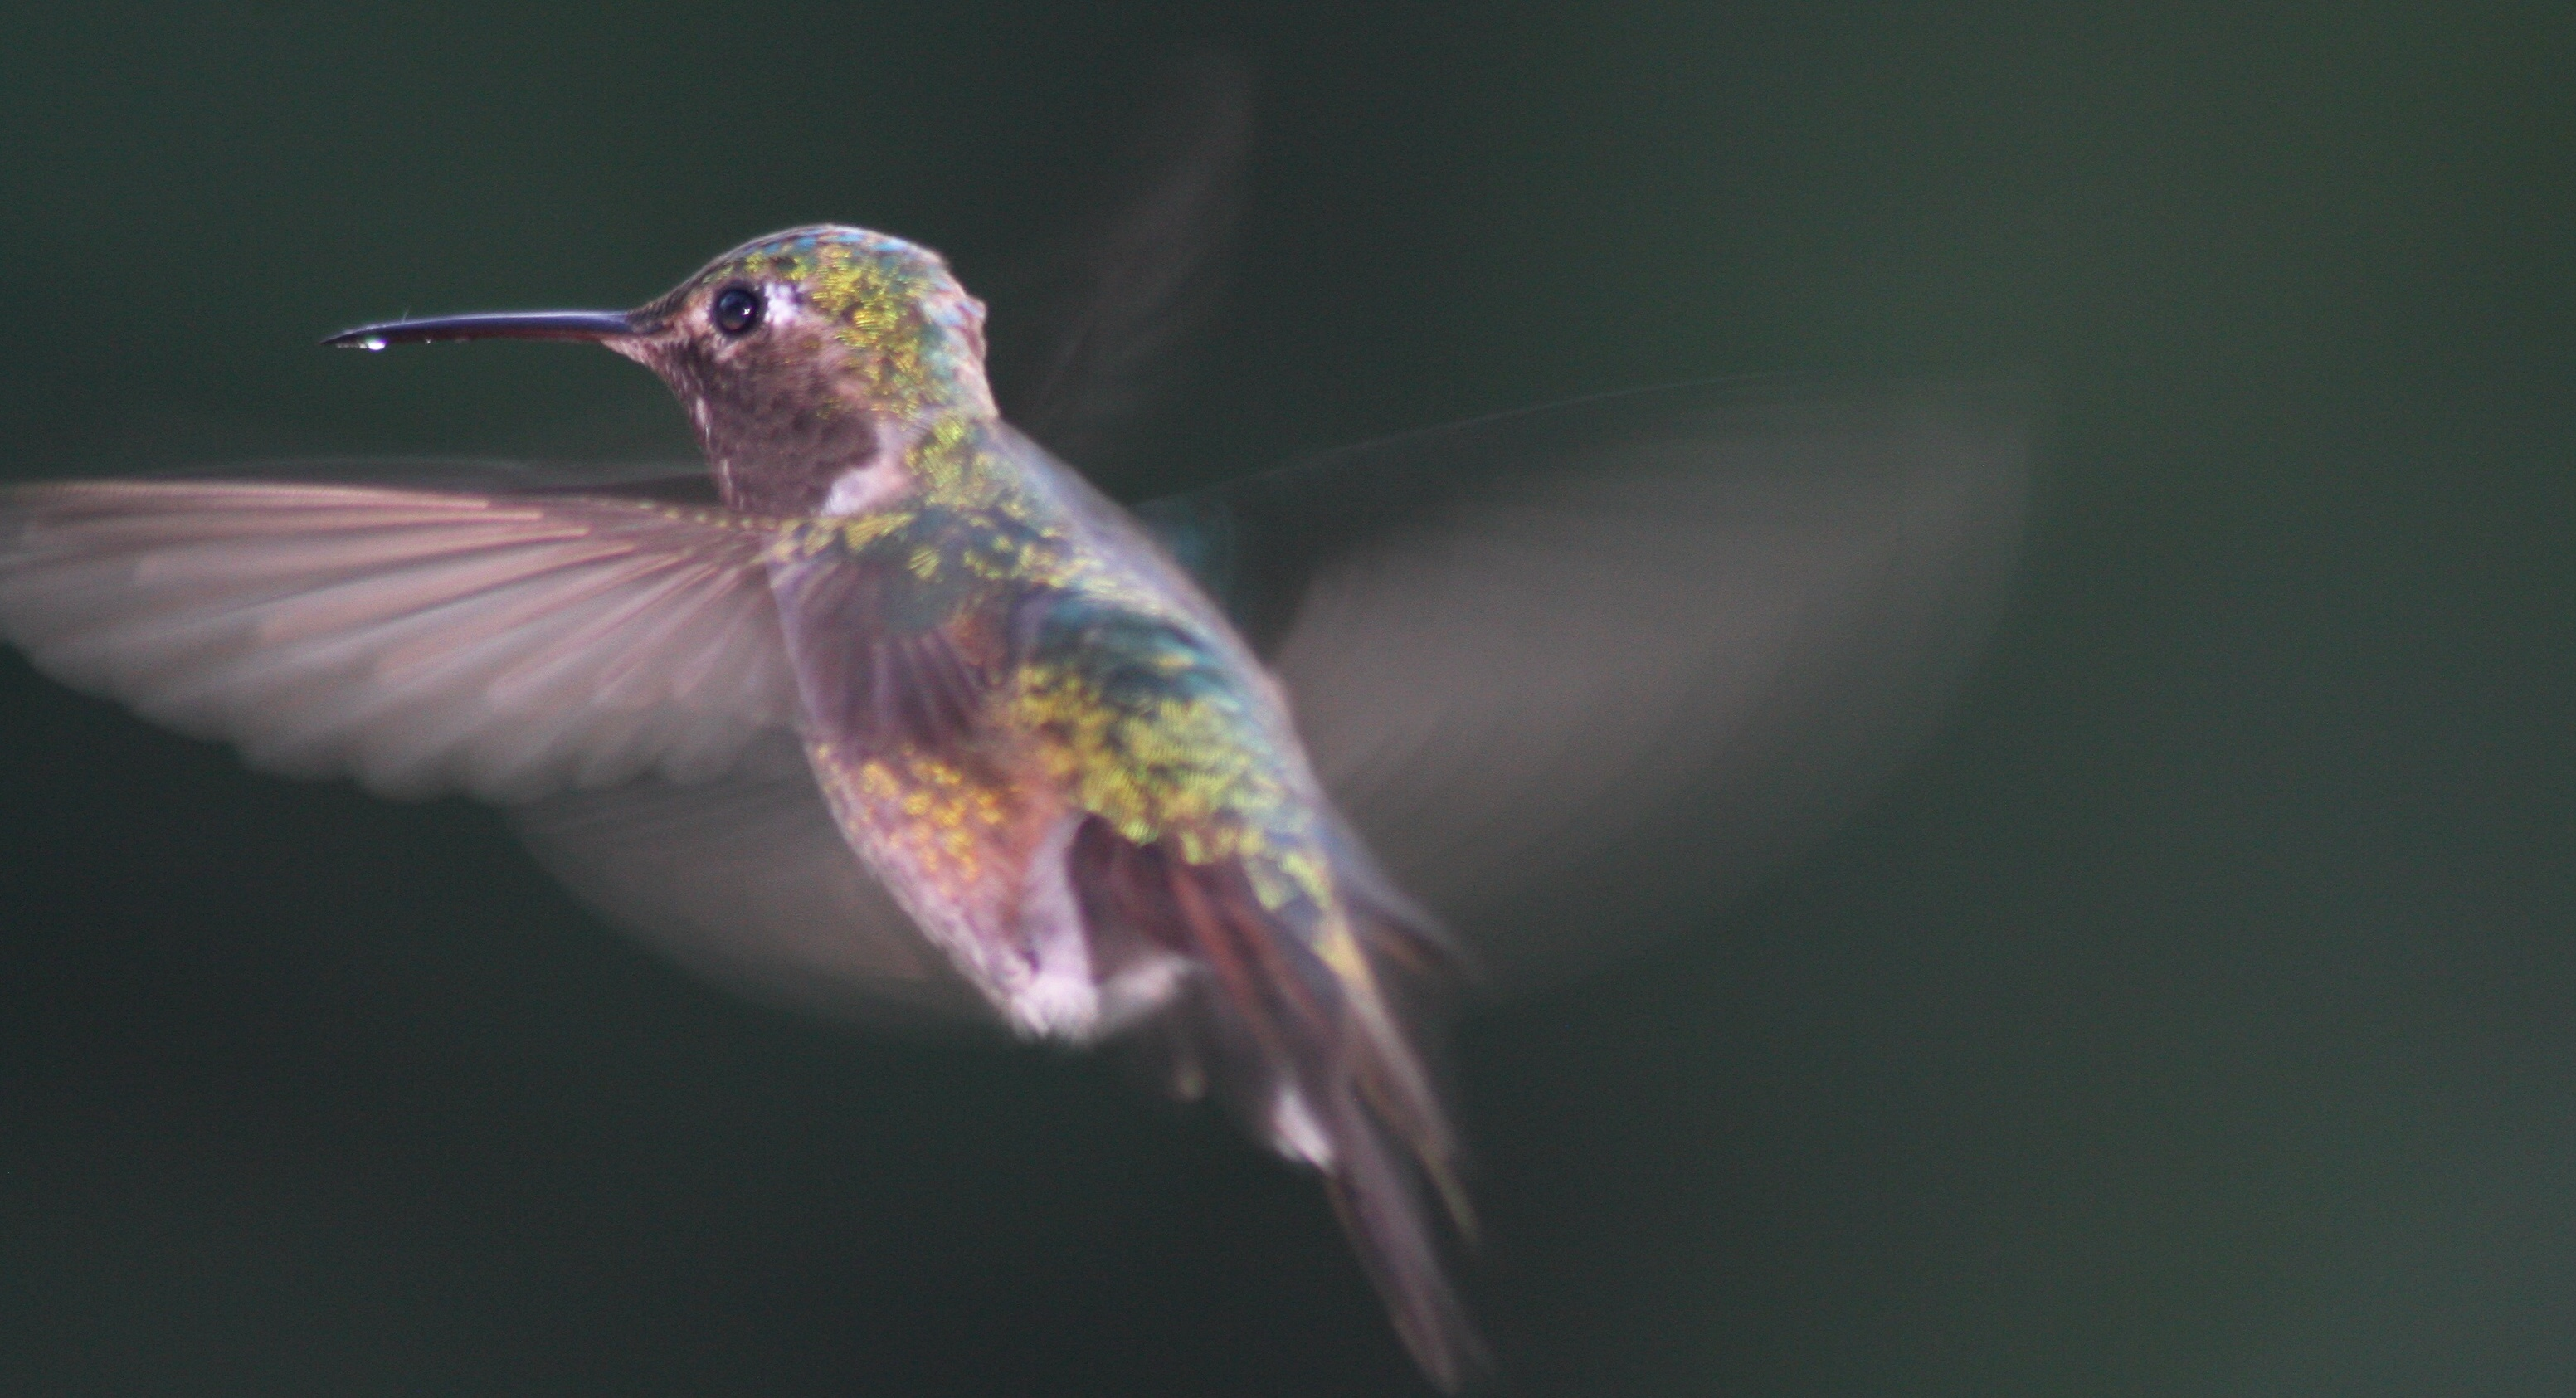 Broad-tailed_Hummingbird_male,_in_flight;_Selasphorus_platycercus